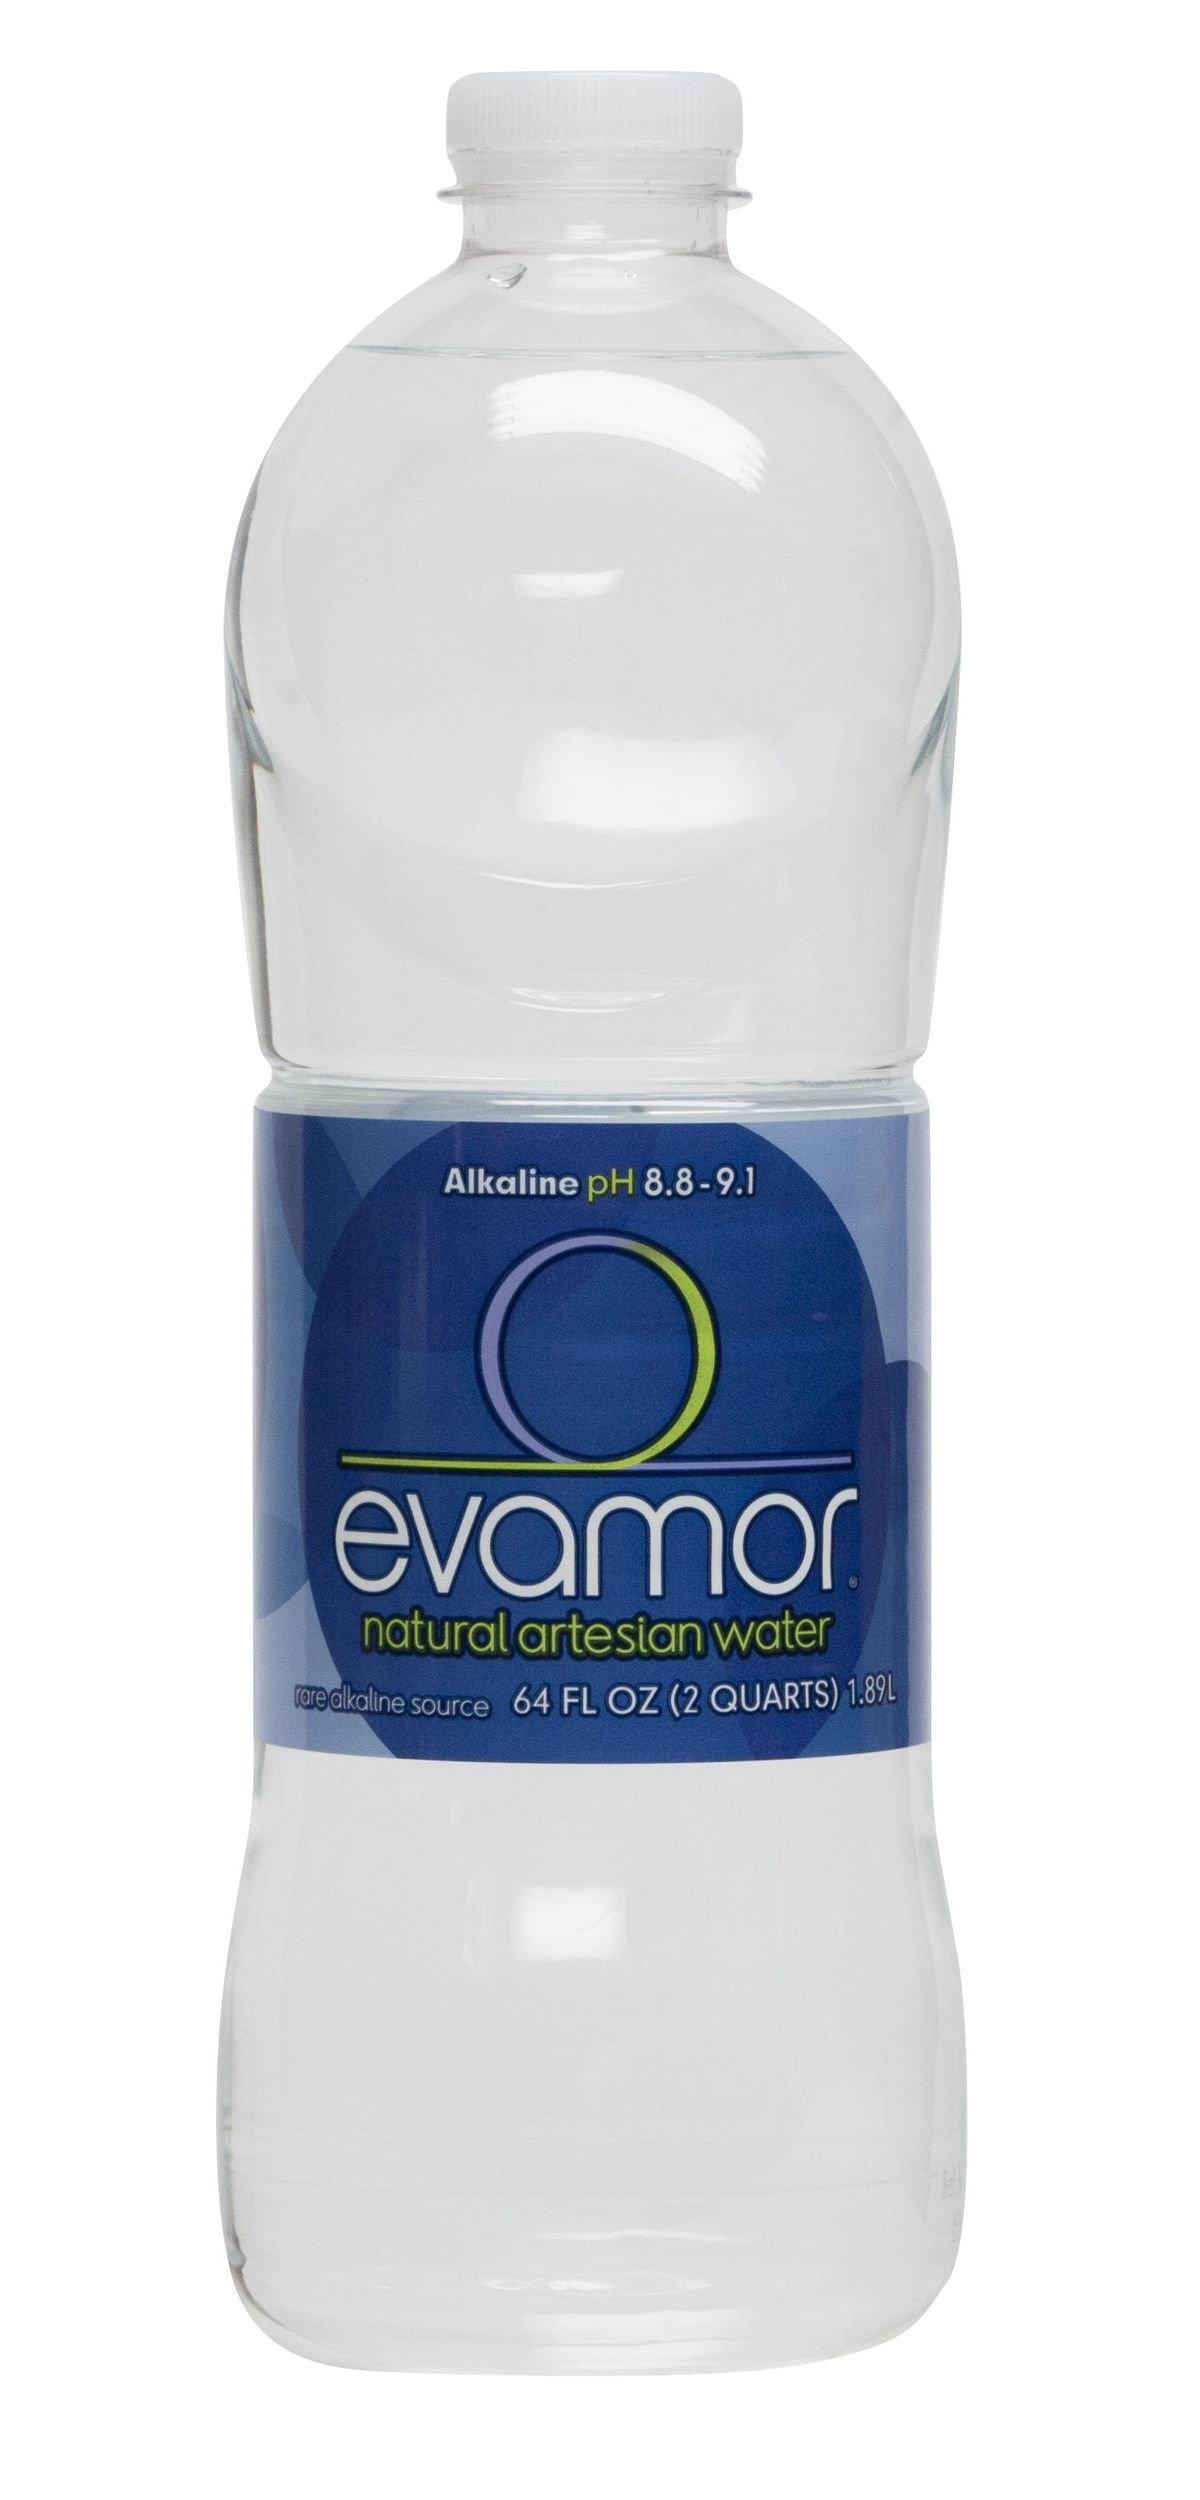 Evamor Natural Alkaline Artesian Water, 64-Ounce (Pack of 6)